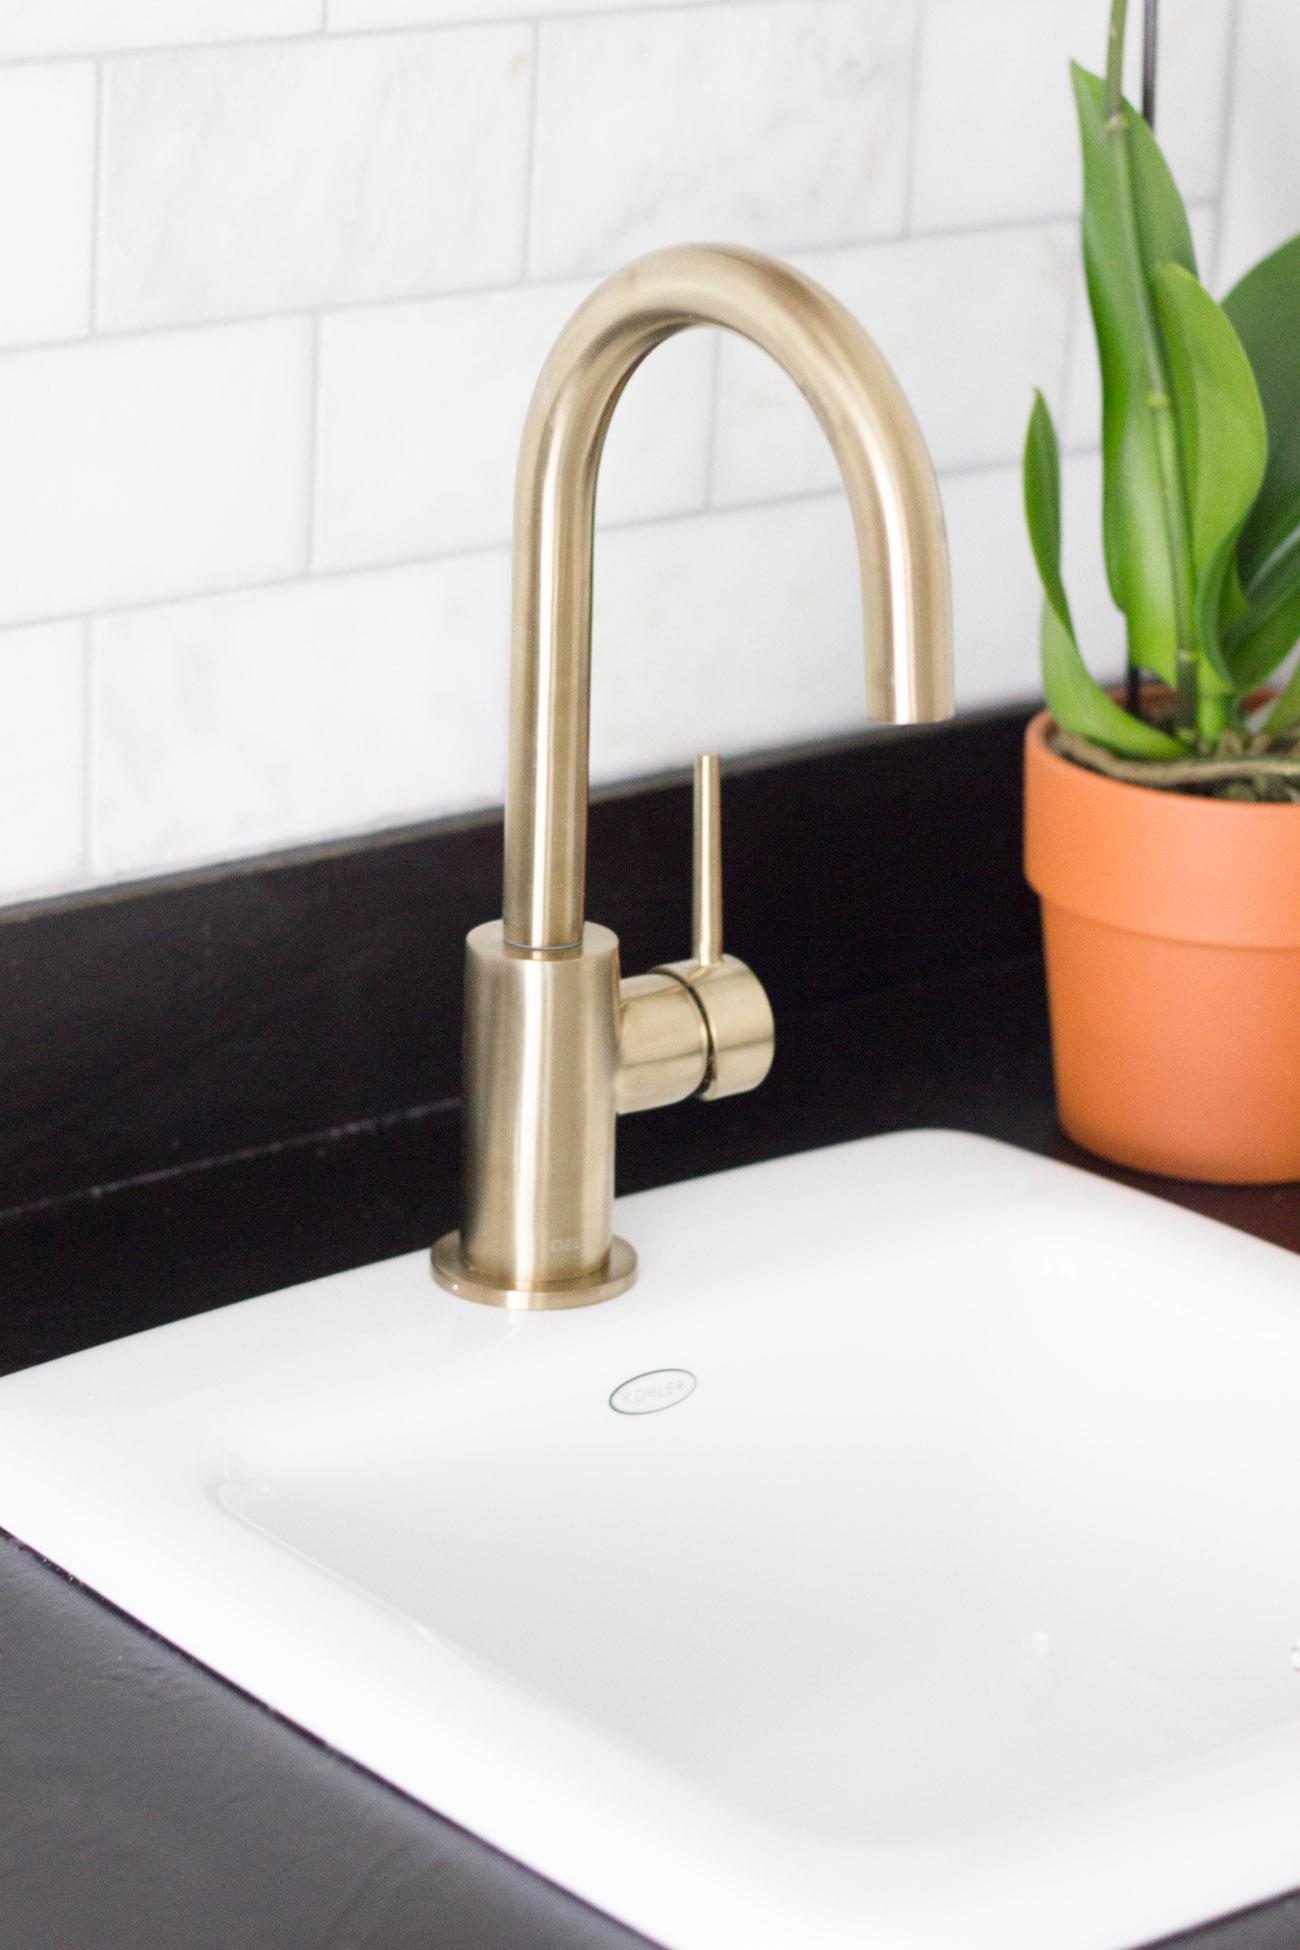 Delta trinsic bar prep faucet erin spain for Delta trinsic bathroom sink faucet